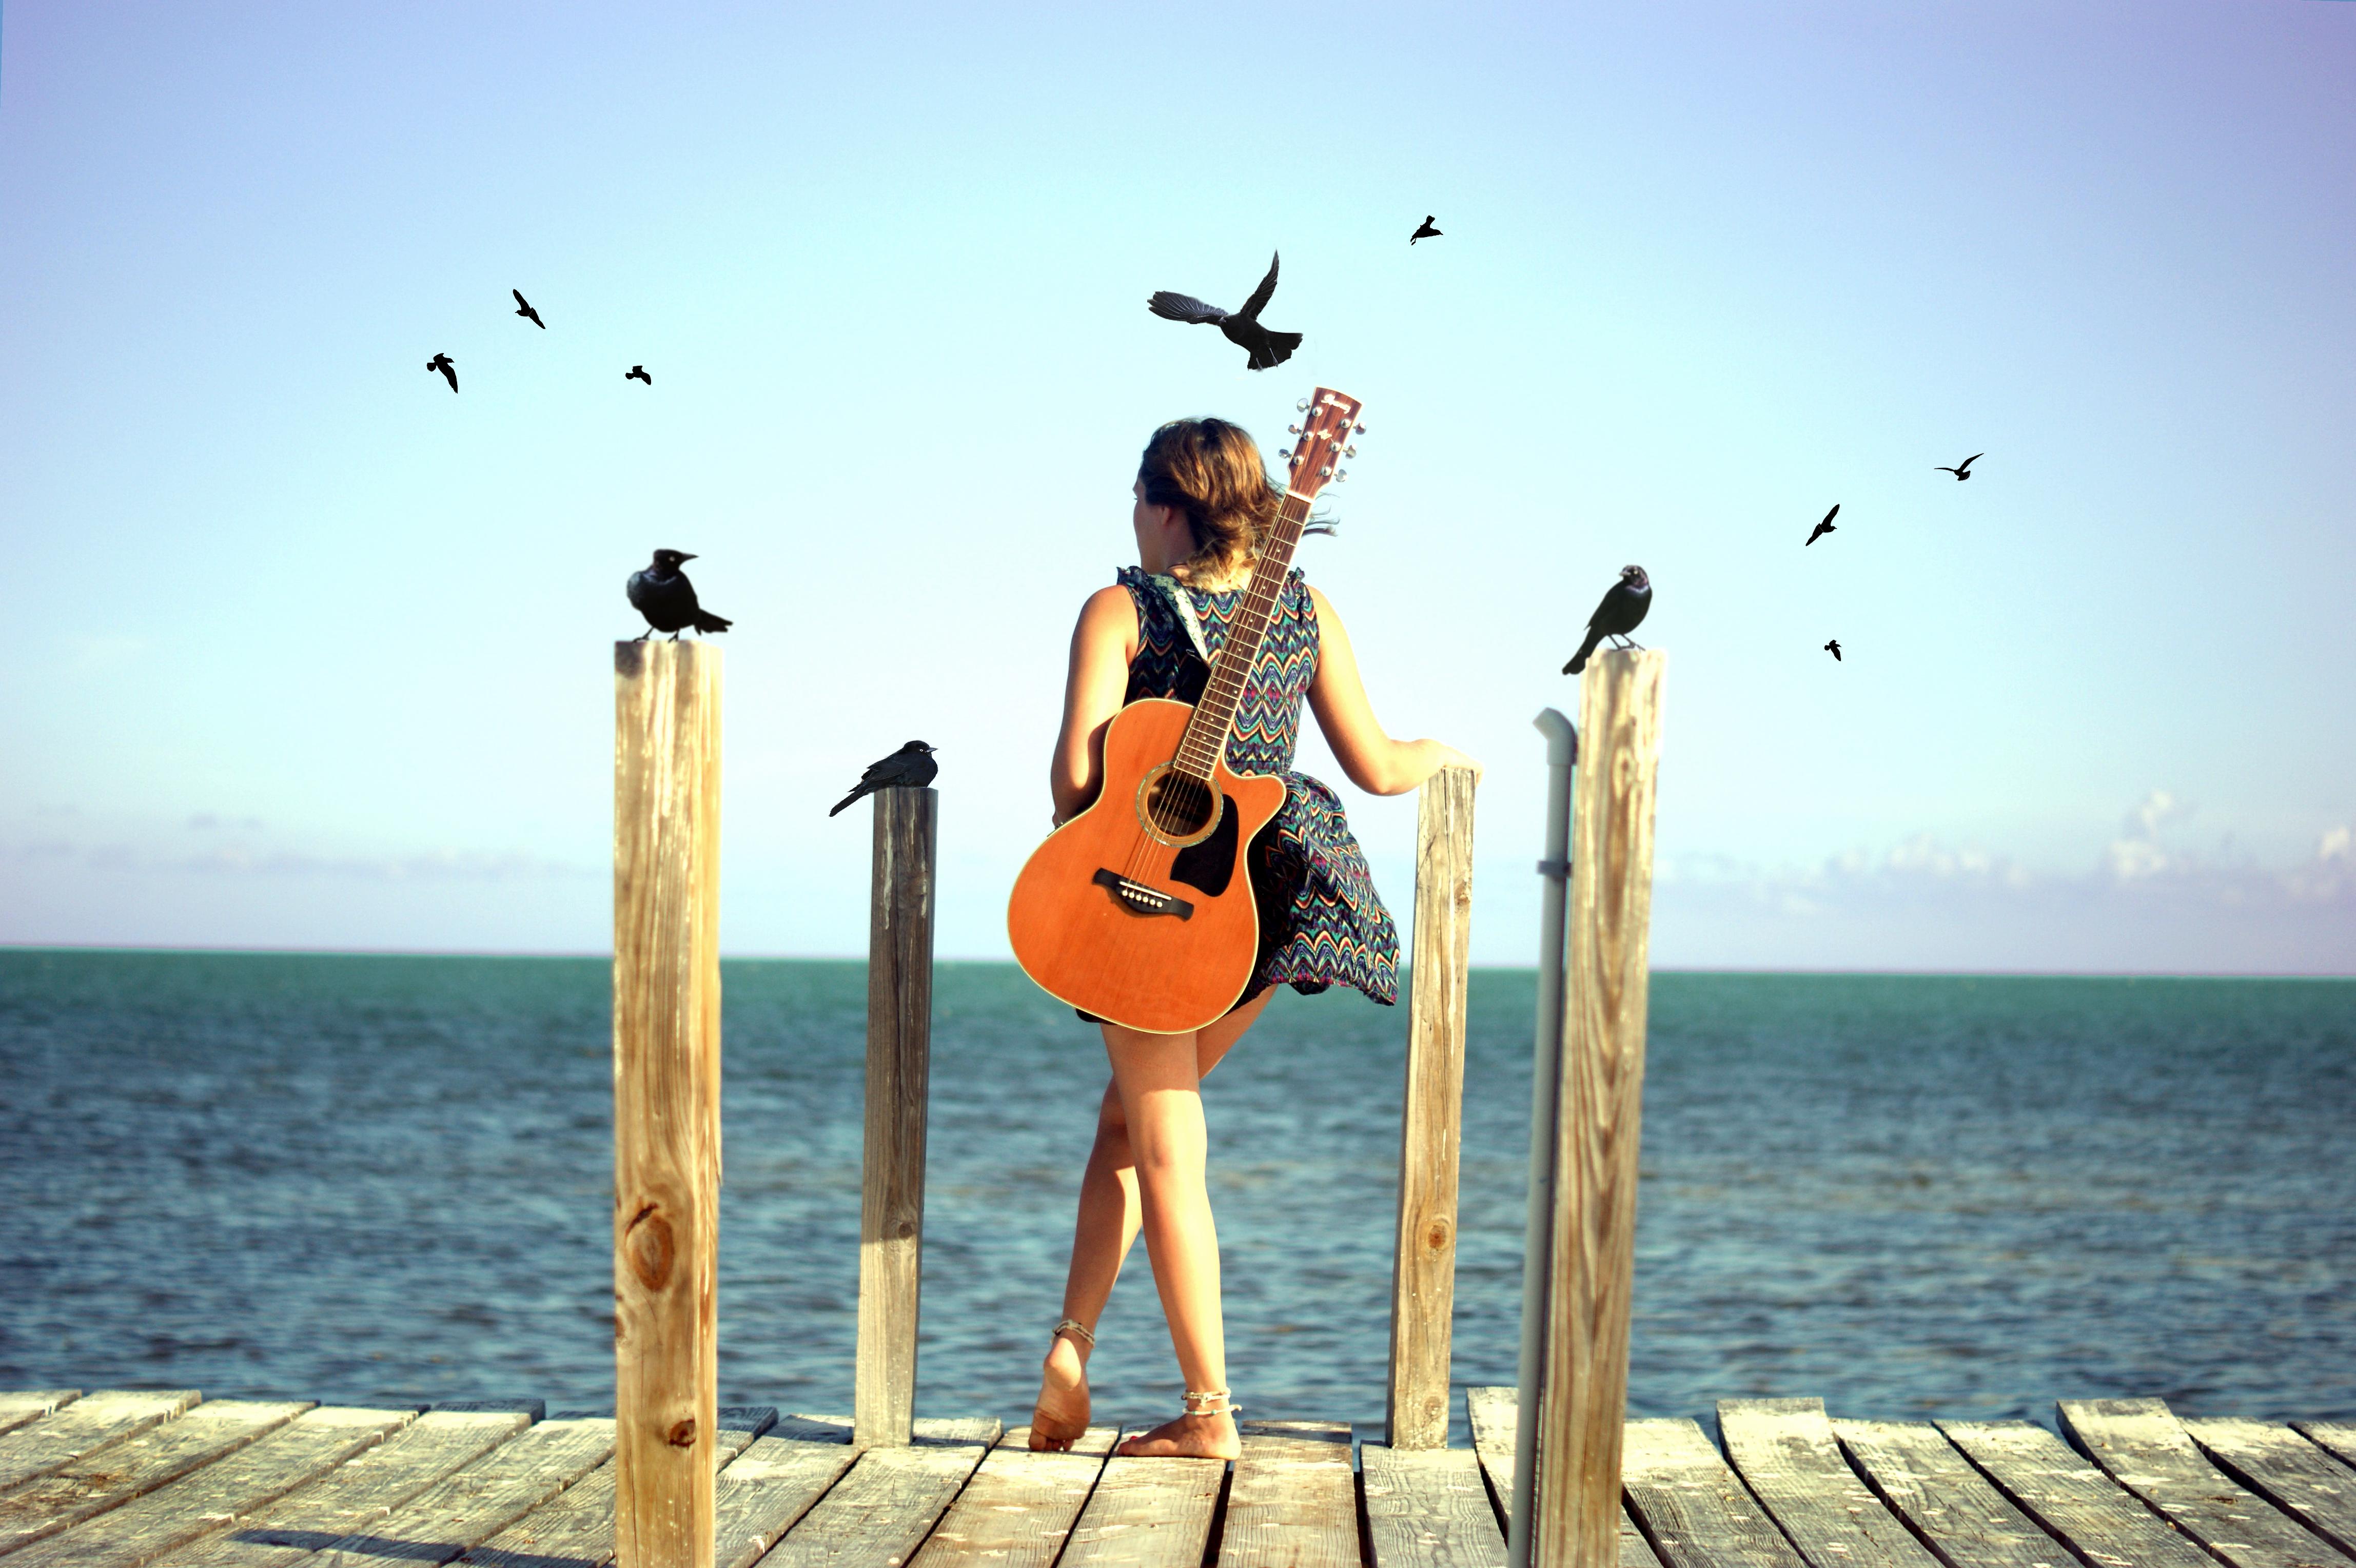 Amazing Wallpaper Music Summer - birds-sea-water-barefoot-guitar-beach-music-dress-flying-musician-summer-keys-dock-spring-Florida-vacation-50mm-f18-bird-girl-beauty-ocean-woman-photograph-blackbird-wing-image-beatles-blackbirds-photo-shoot-string-instrument-surfing-equipment-and-supplies-floridakeys-702080  Collection_7035100.jpg